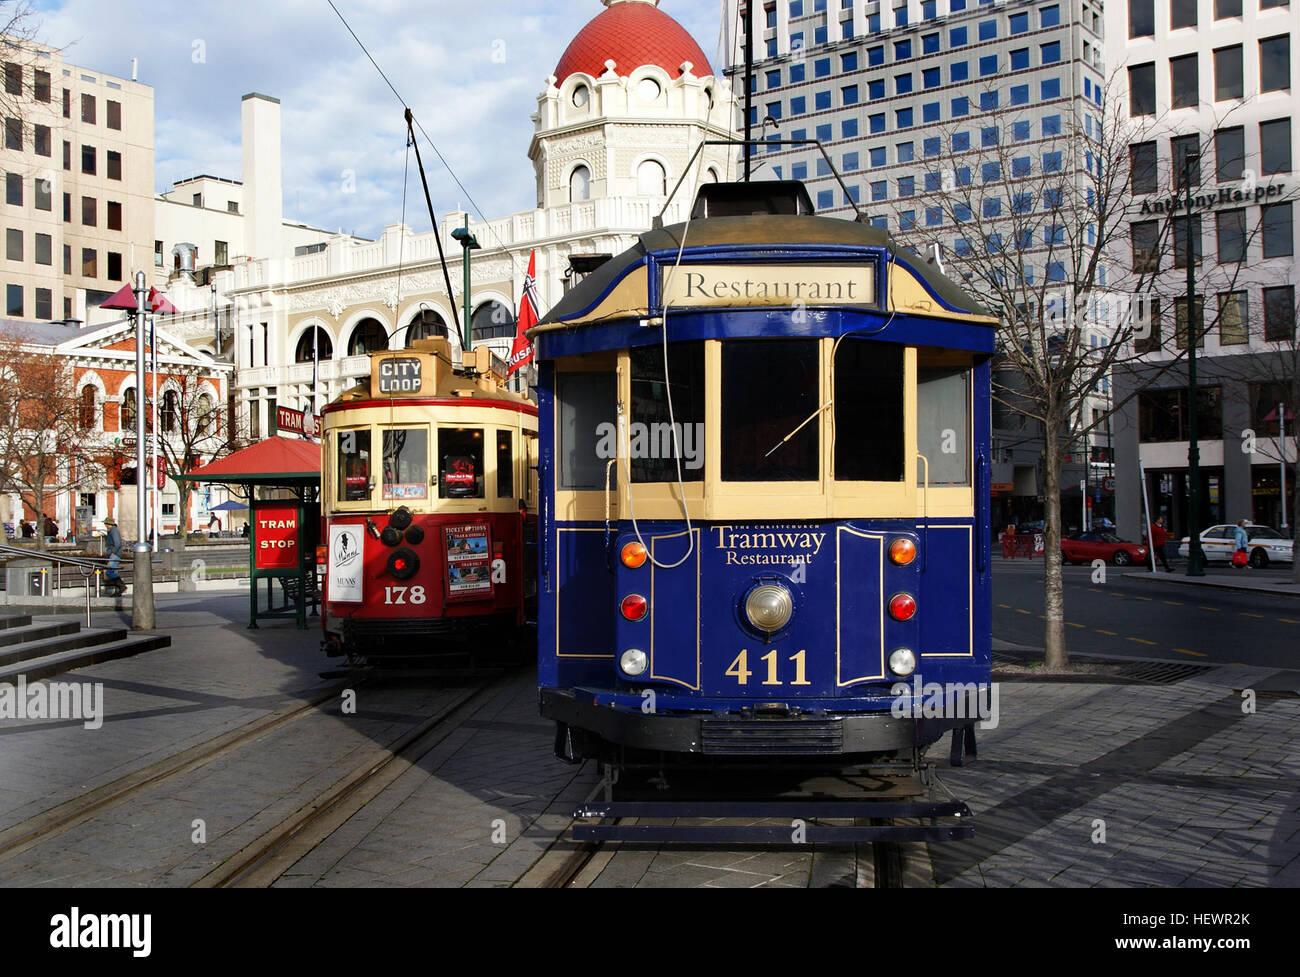 trams in melbourne city stock photos trams in melbourne. Black Bedroom Furniture Sets. Home Design Ideas